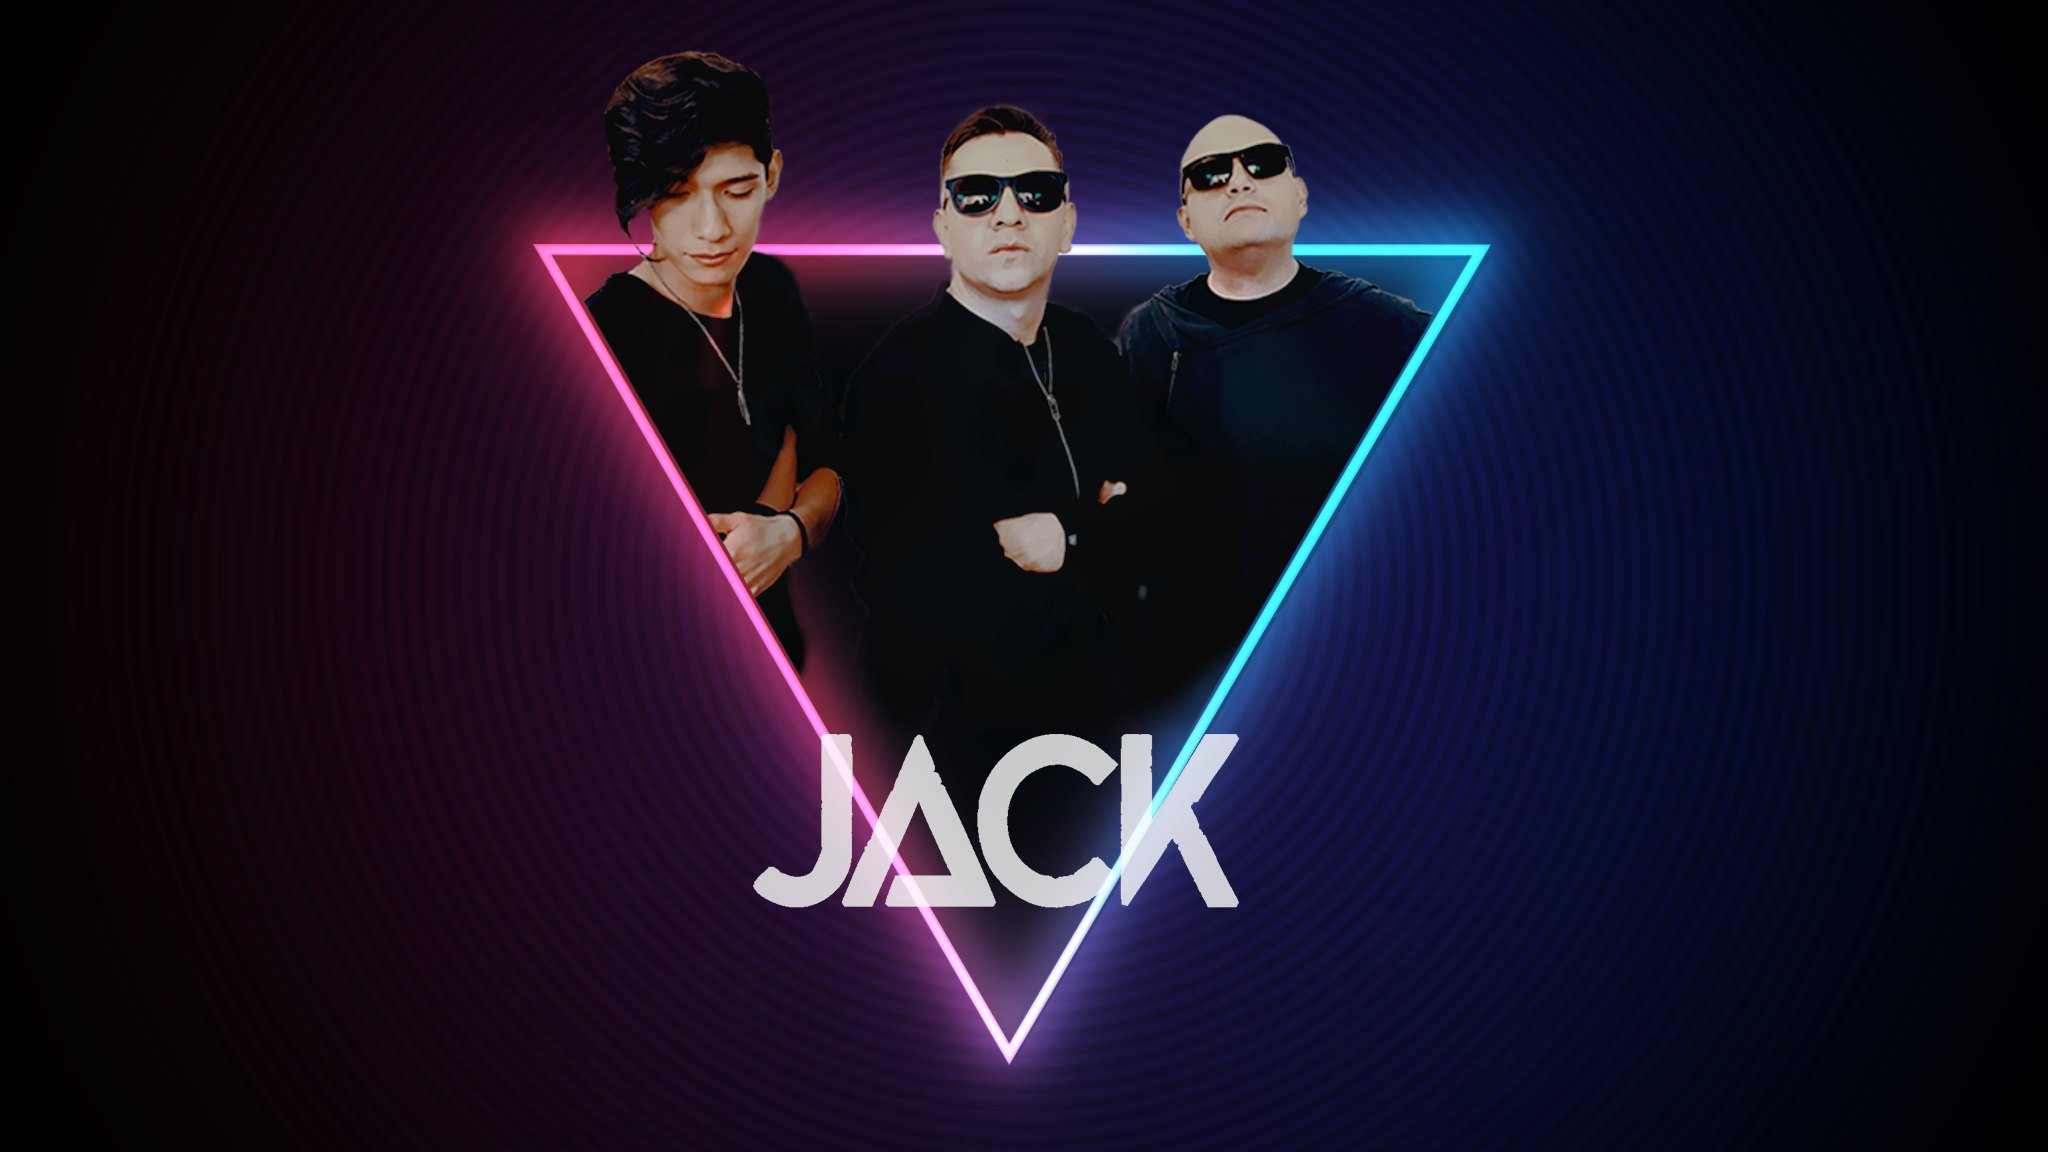 jack neon ok.jpg